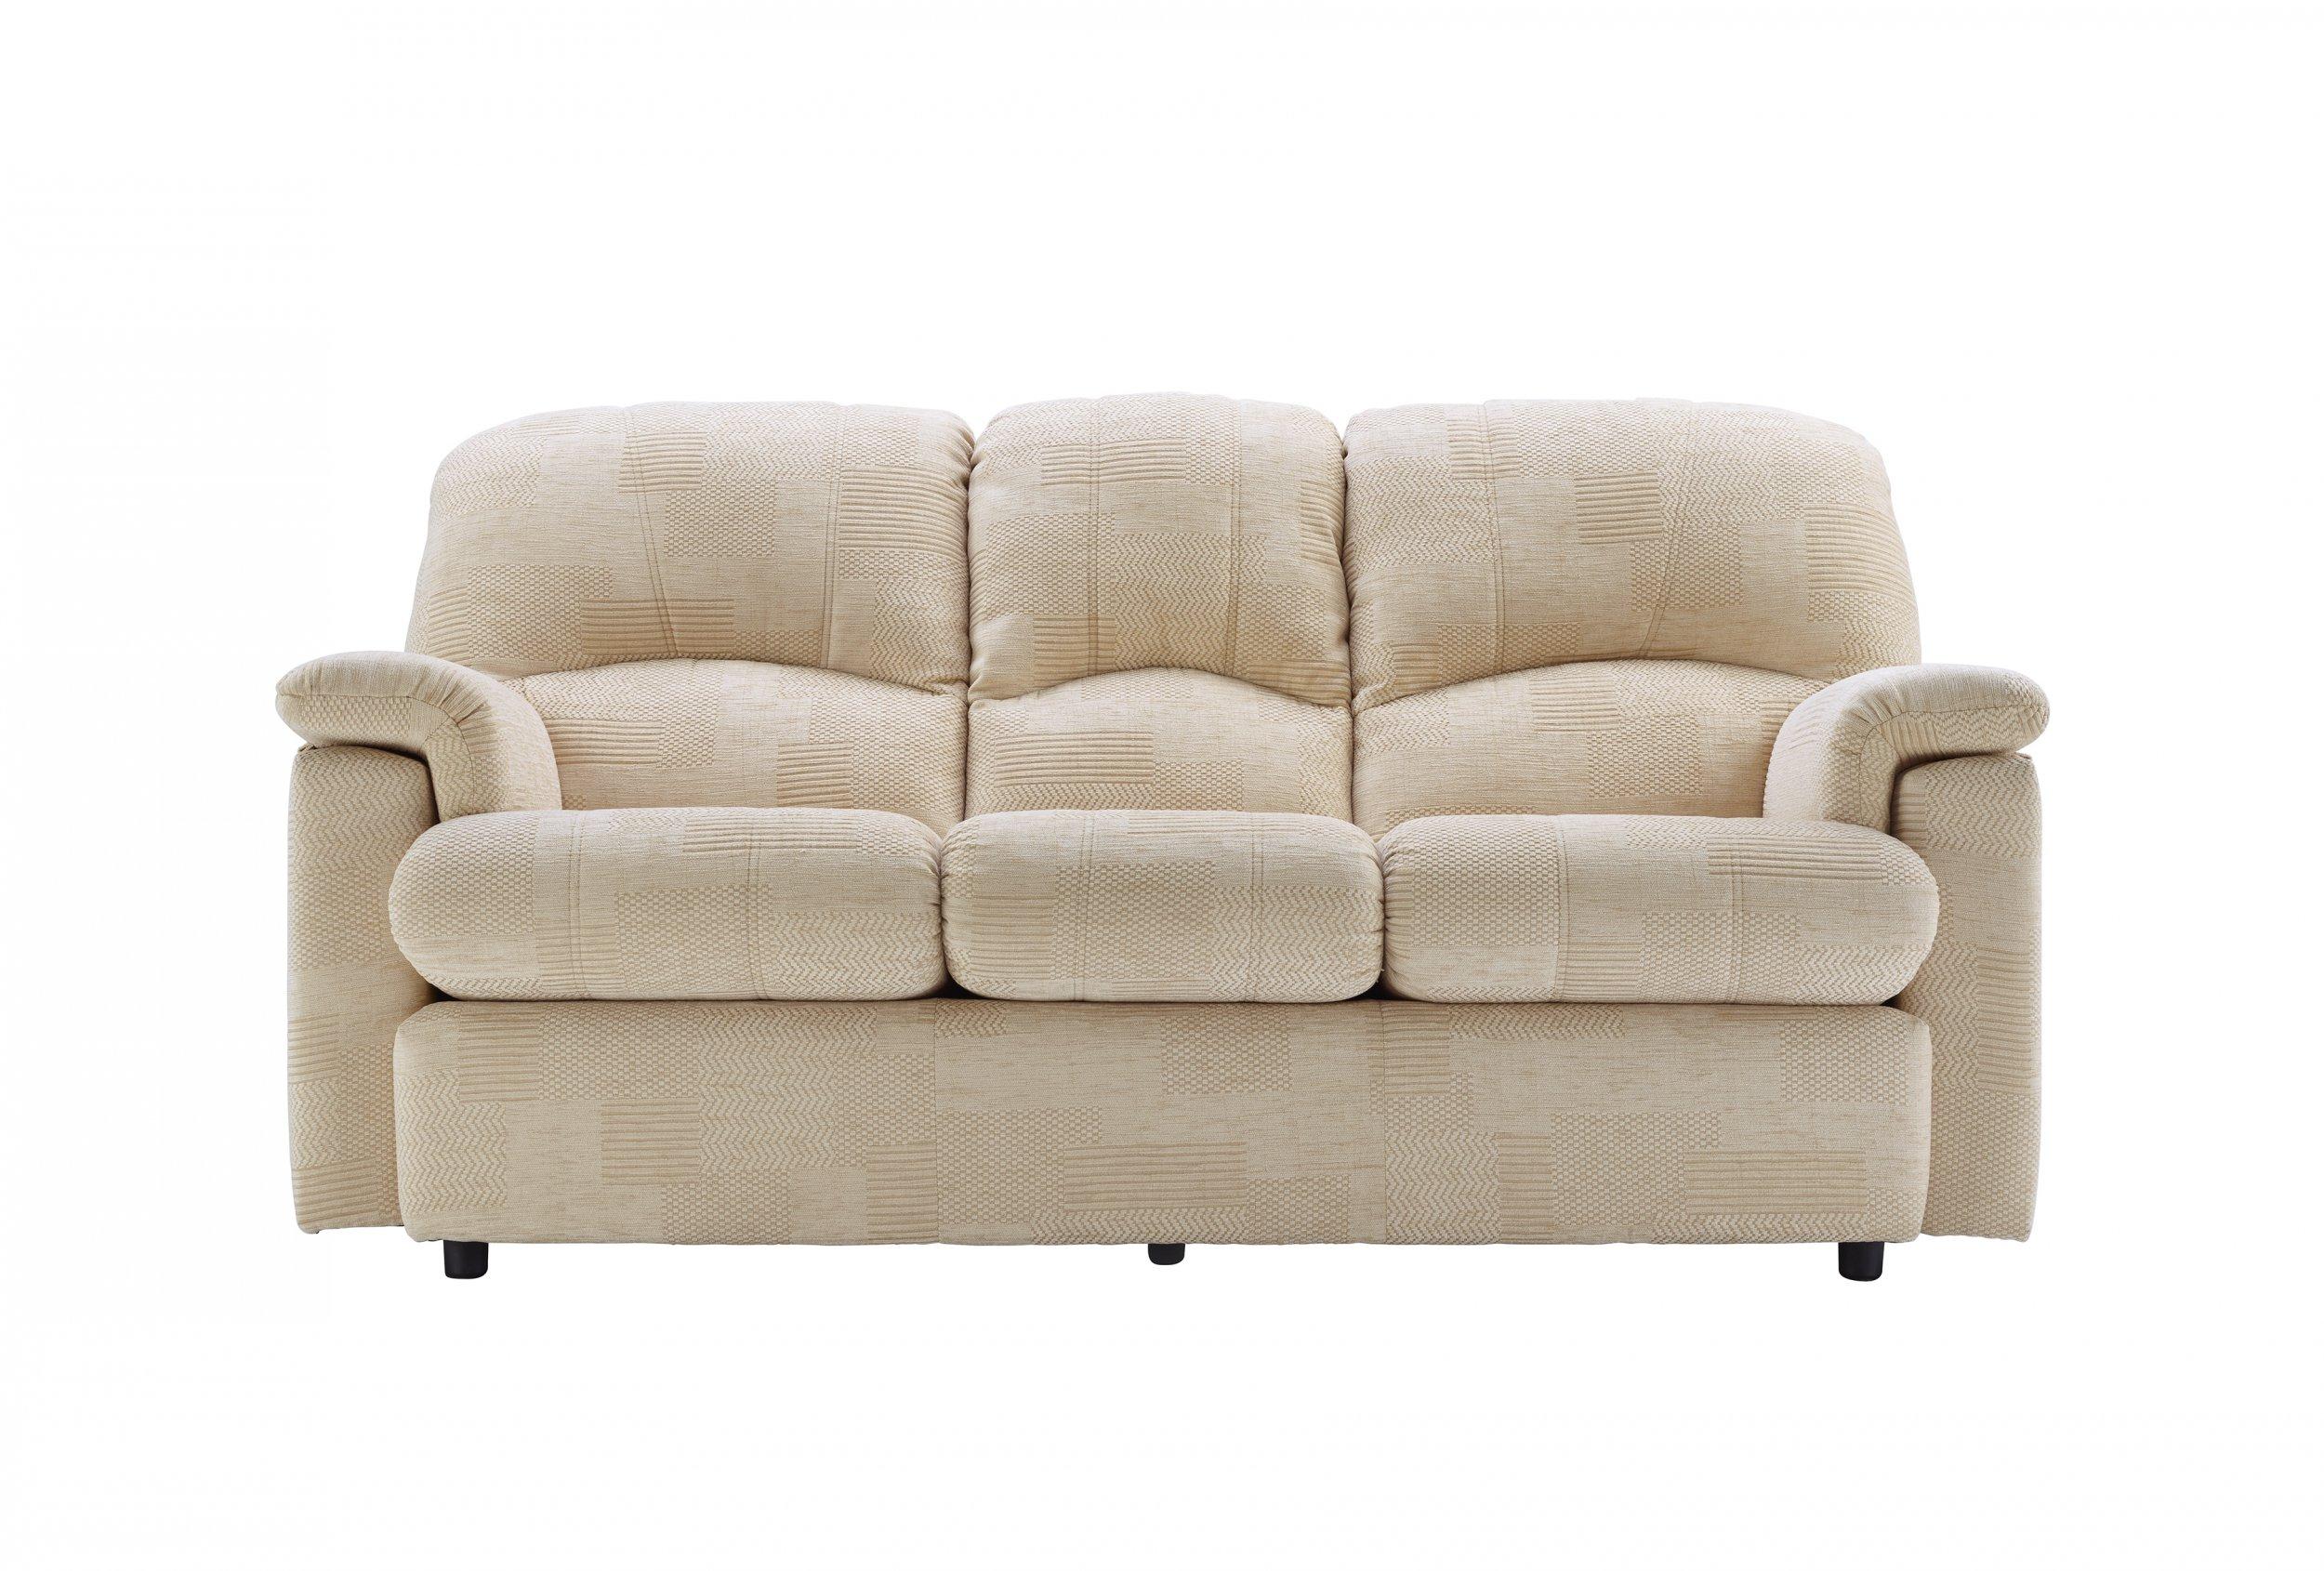 G Plan Furniture Chloe | G Plan Upholstery Chloe | G plan Chloe ...